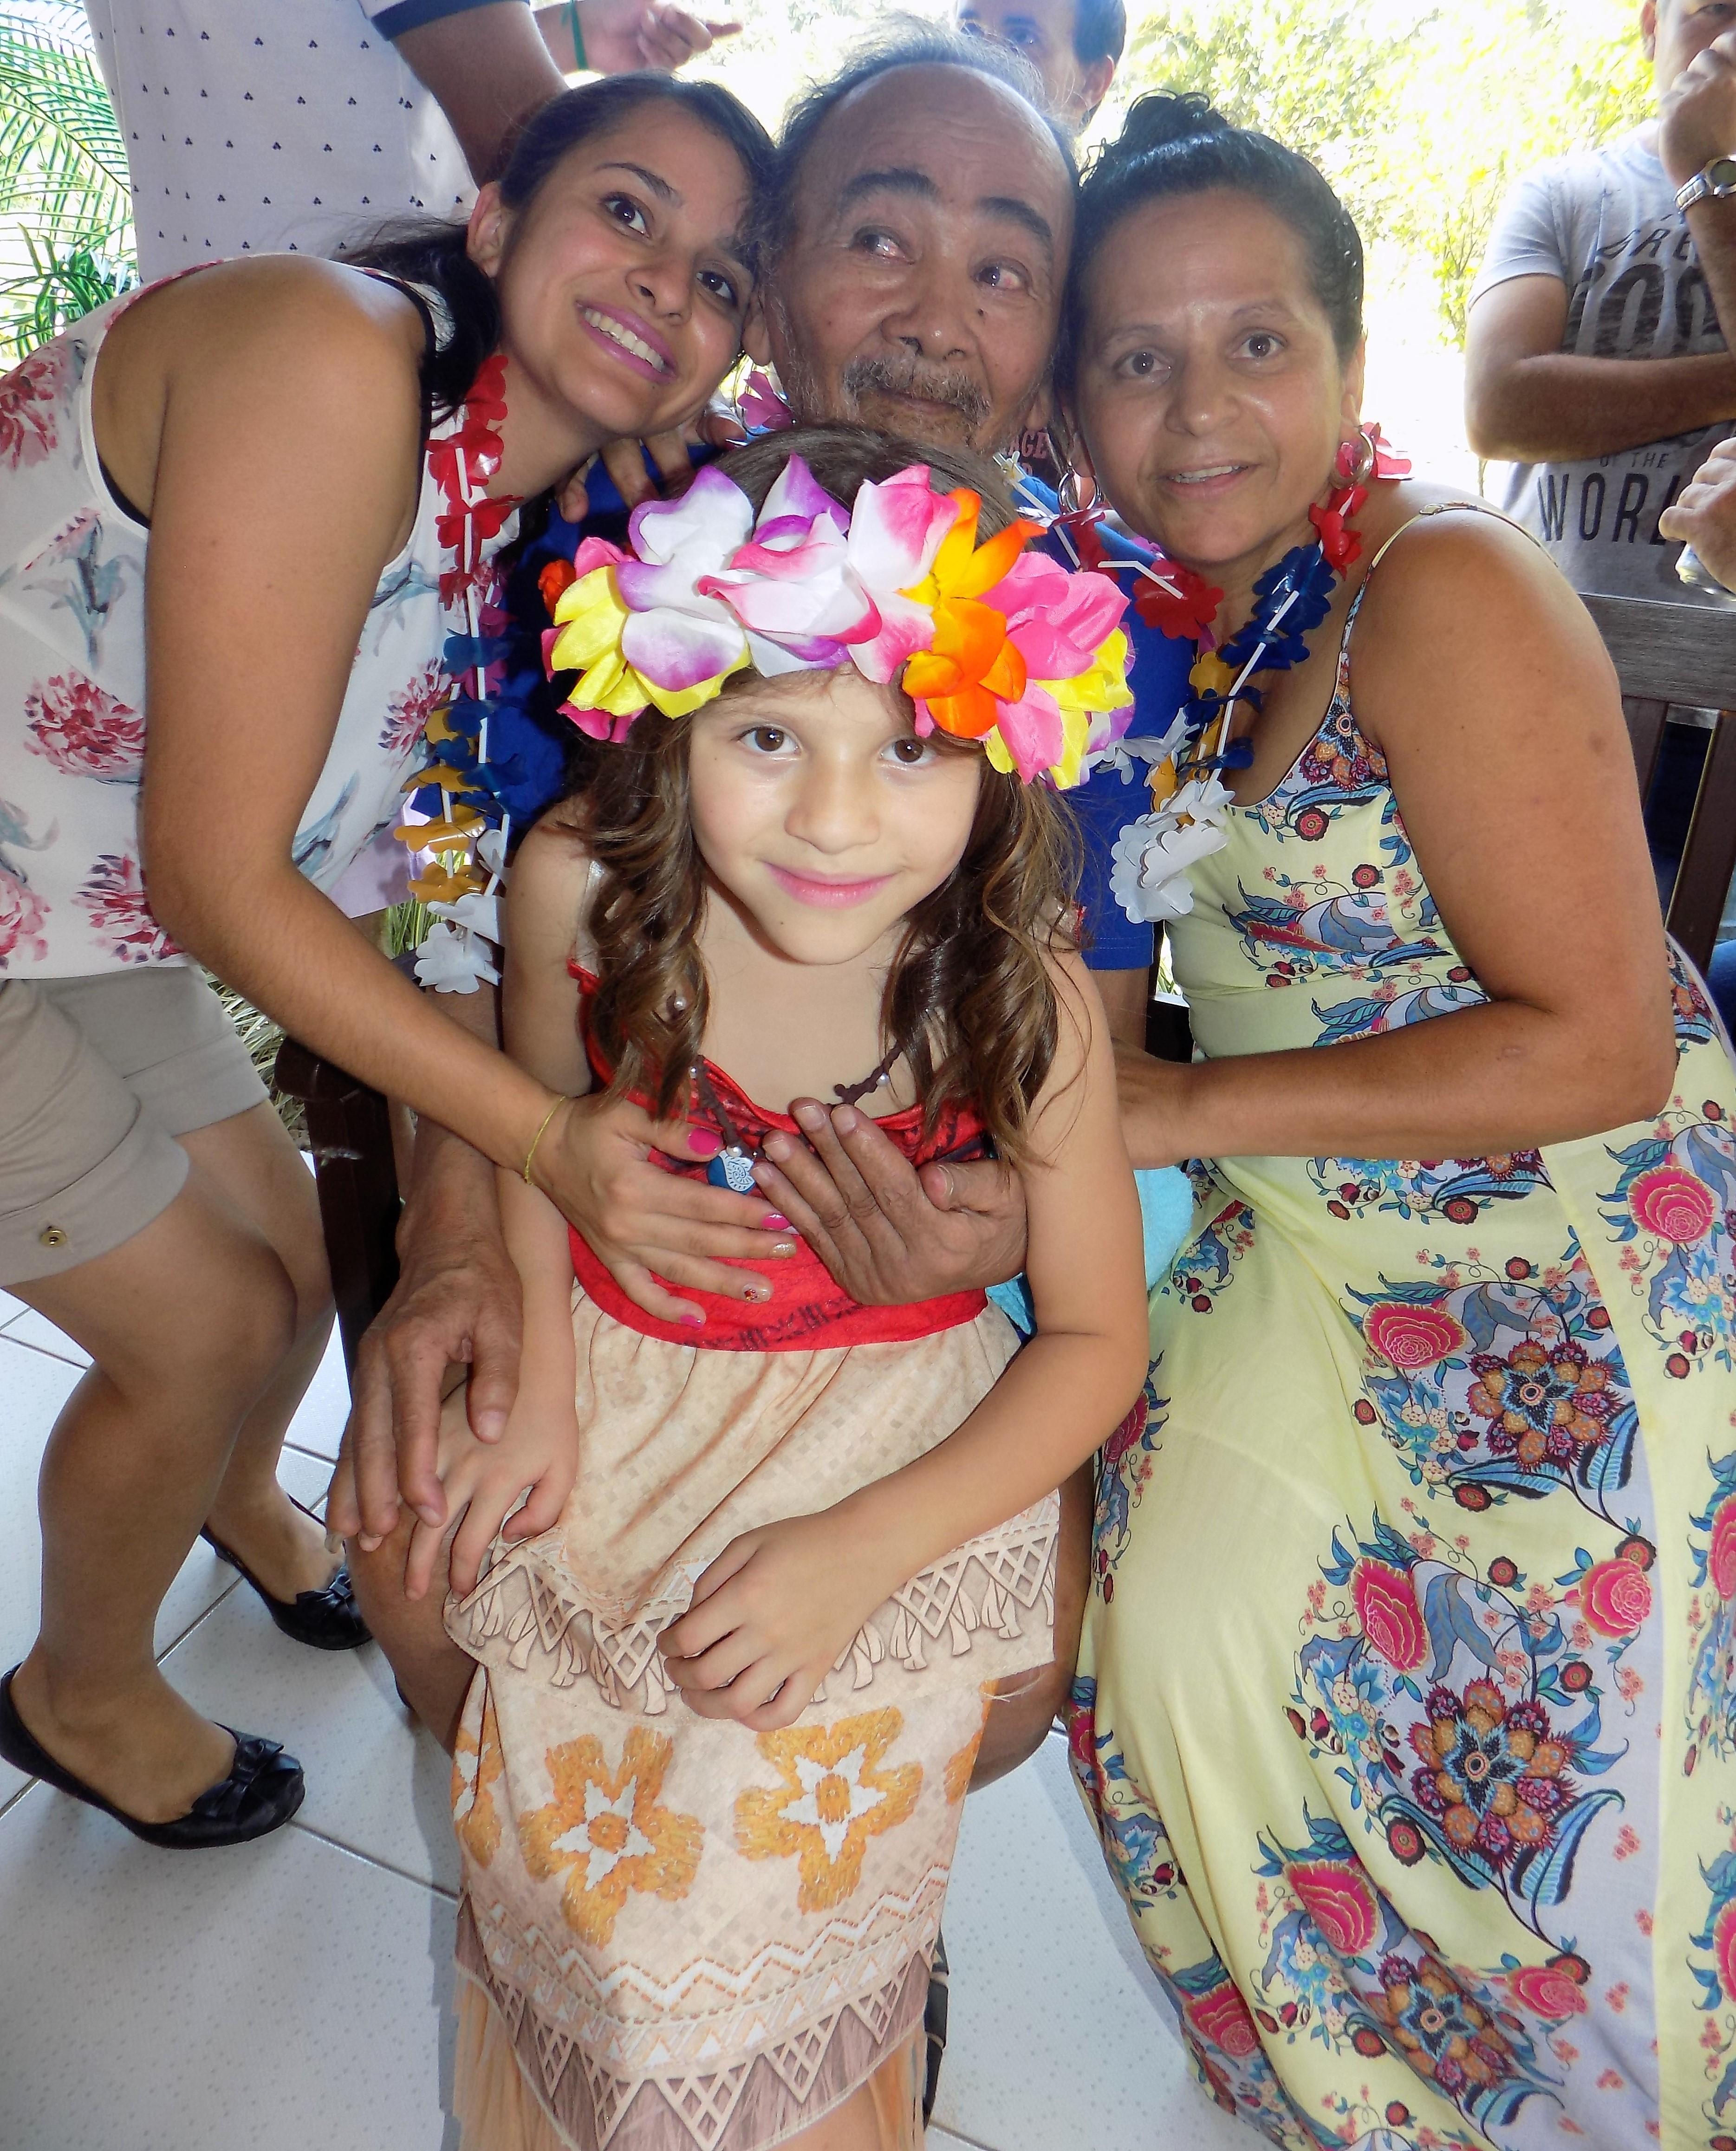 daiane-cristiana-araujo-steffens-minha-filha-mariana-steffens-e-minha-mae-maria-da-gloria-araujo